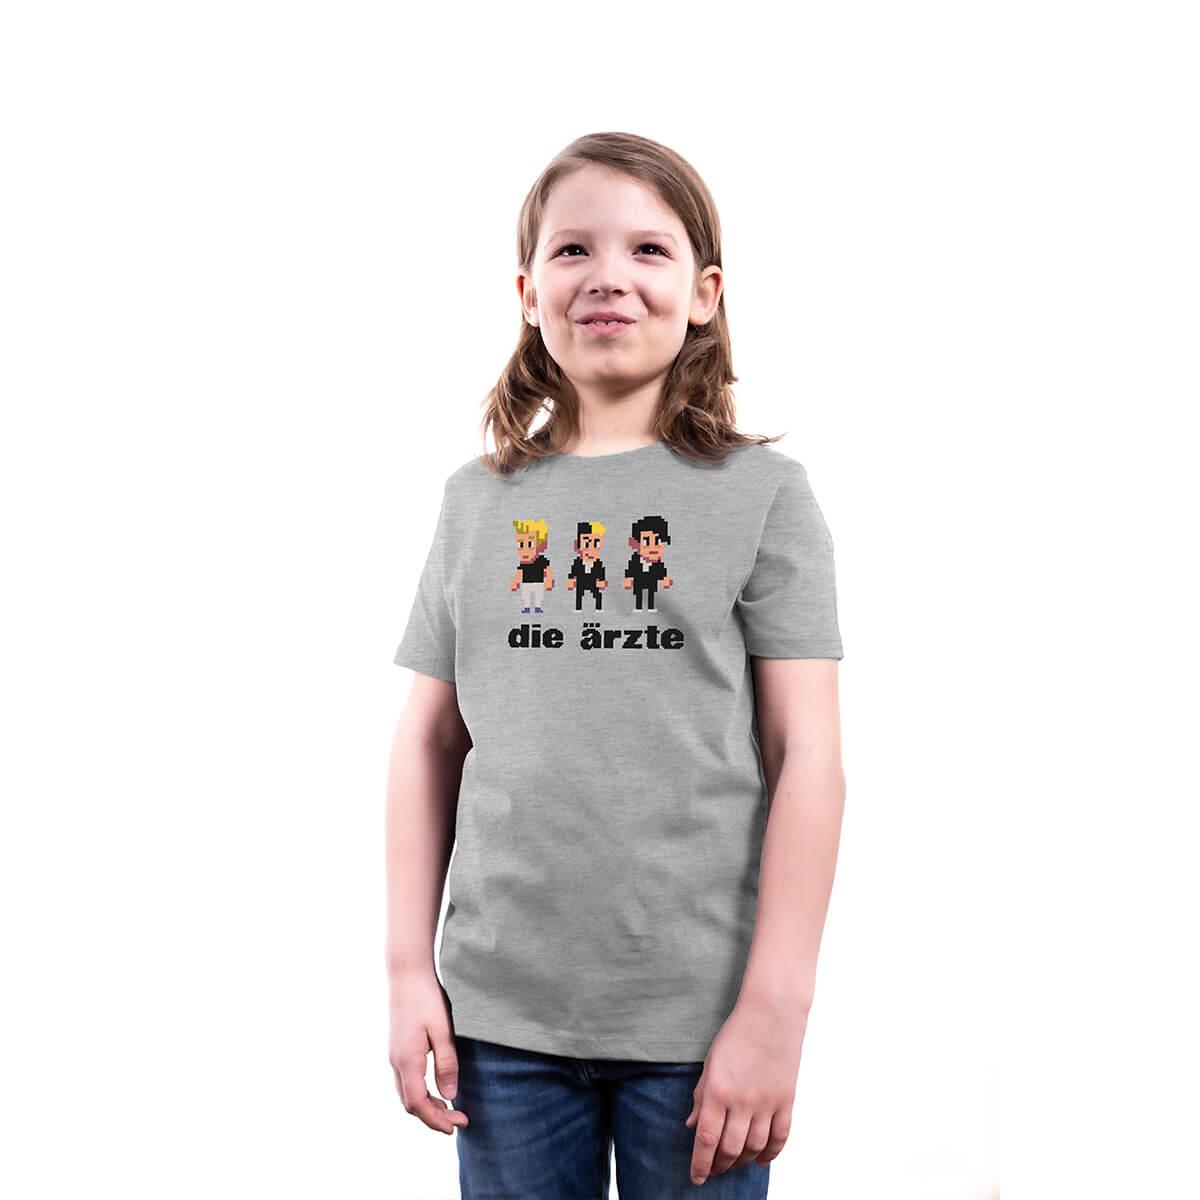 Pixel Heather Grey | Kinder Shirt